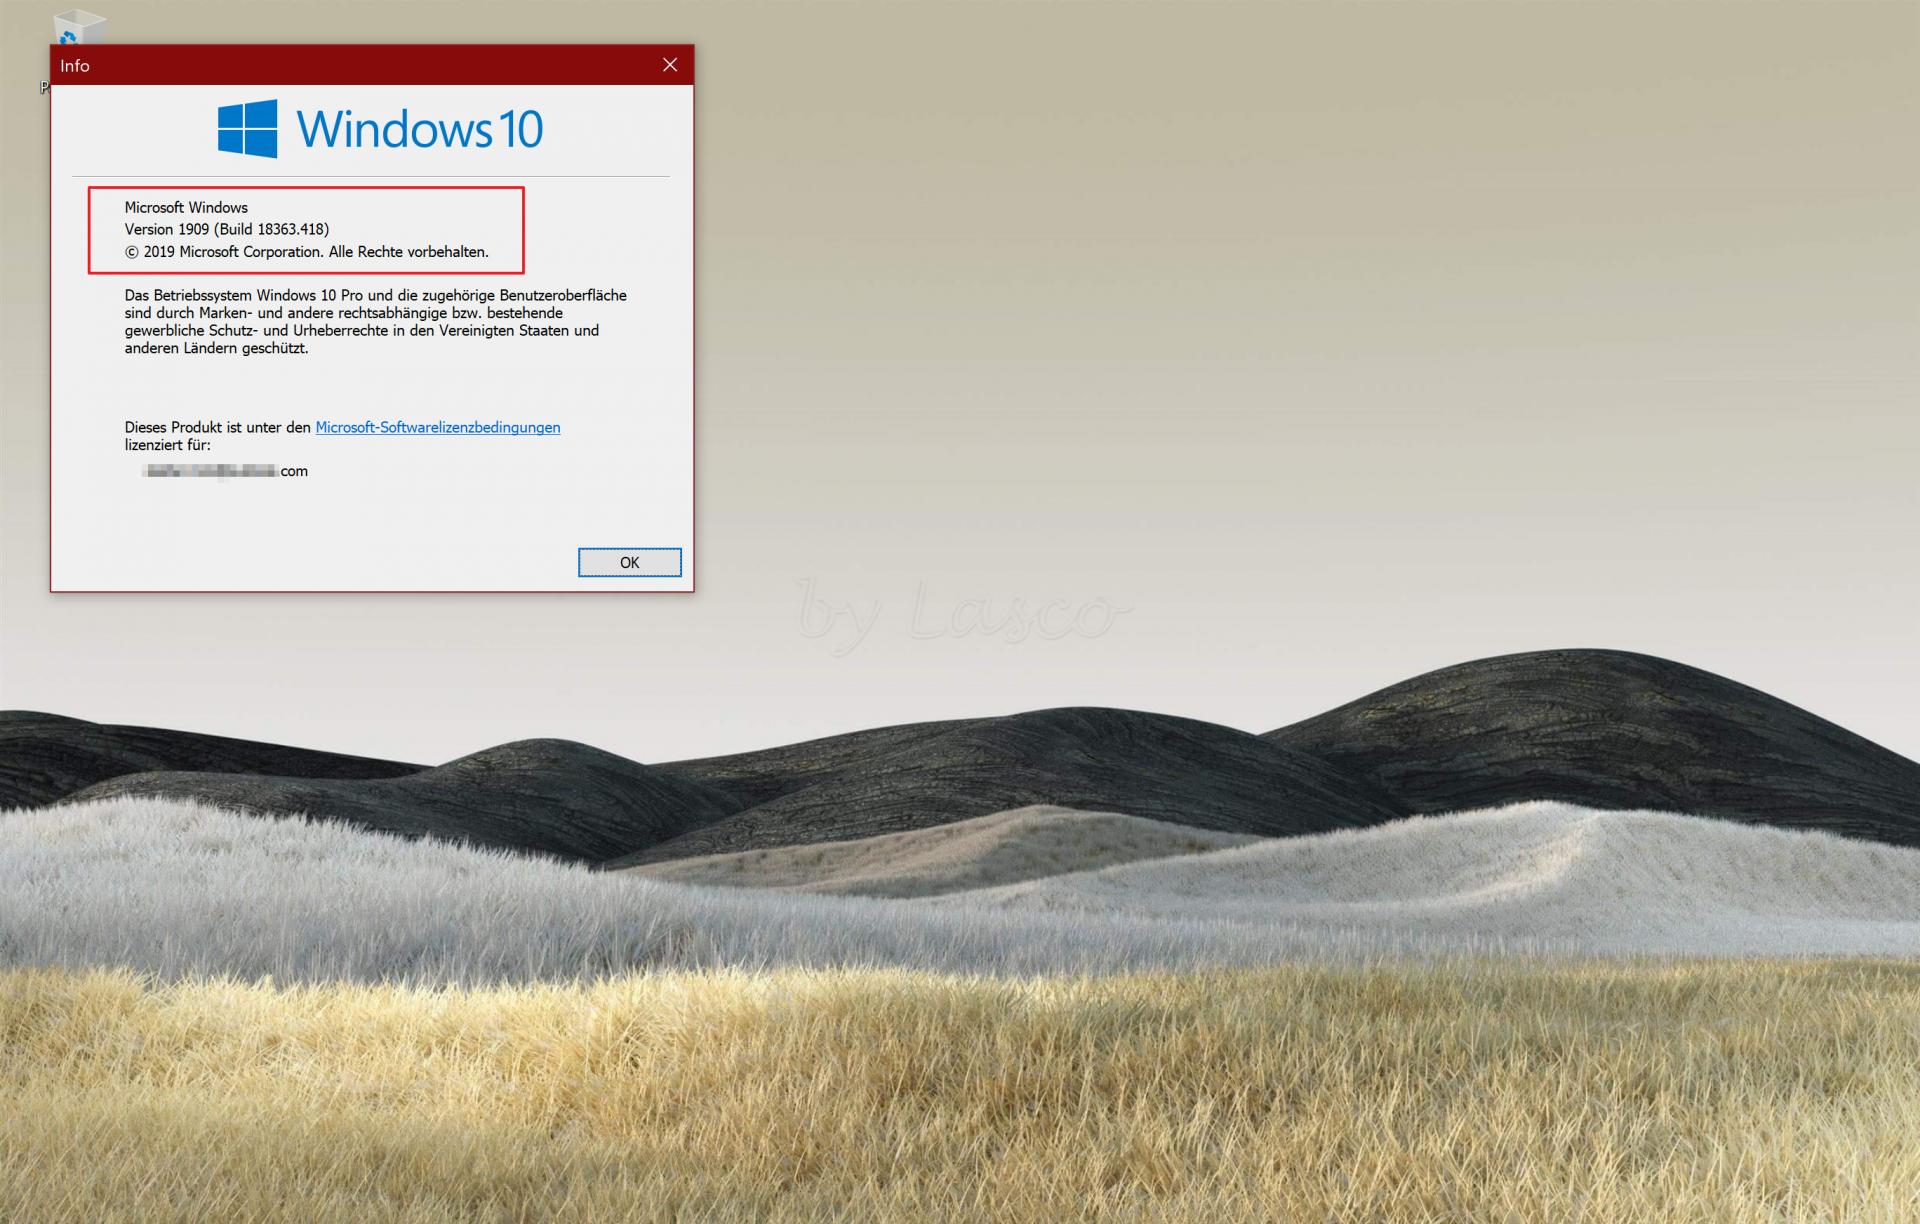 Windows-10_Version-20H2-1909.png